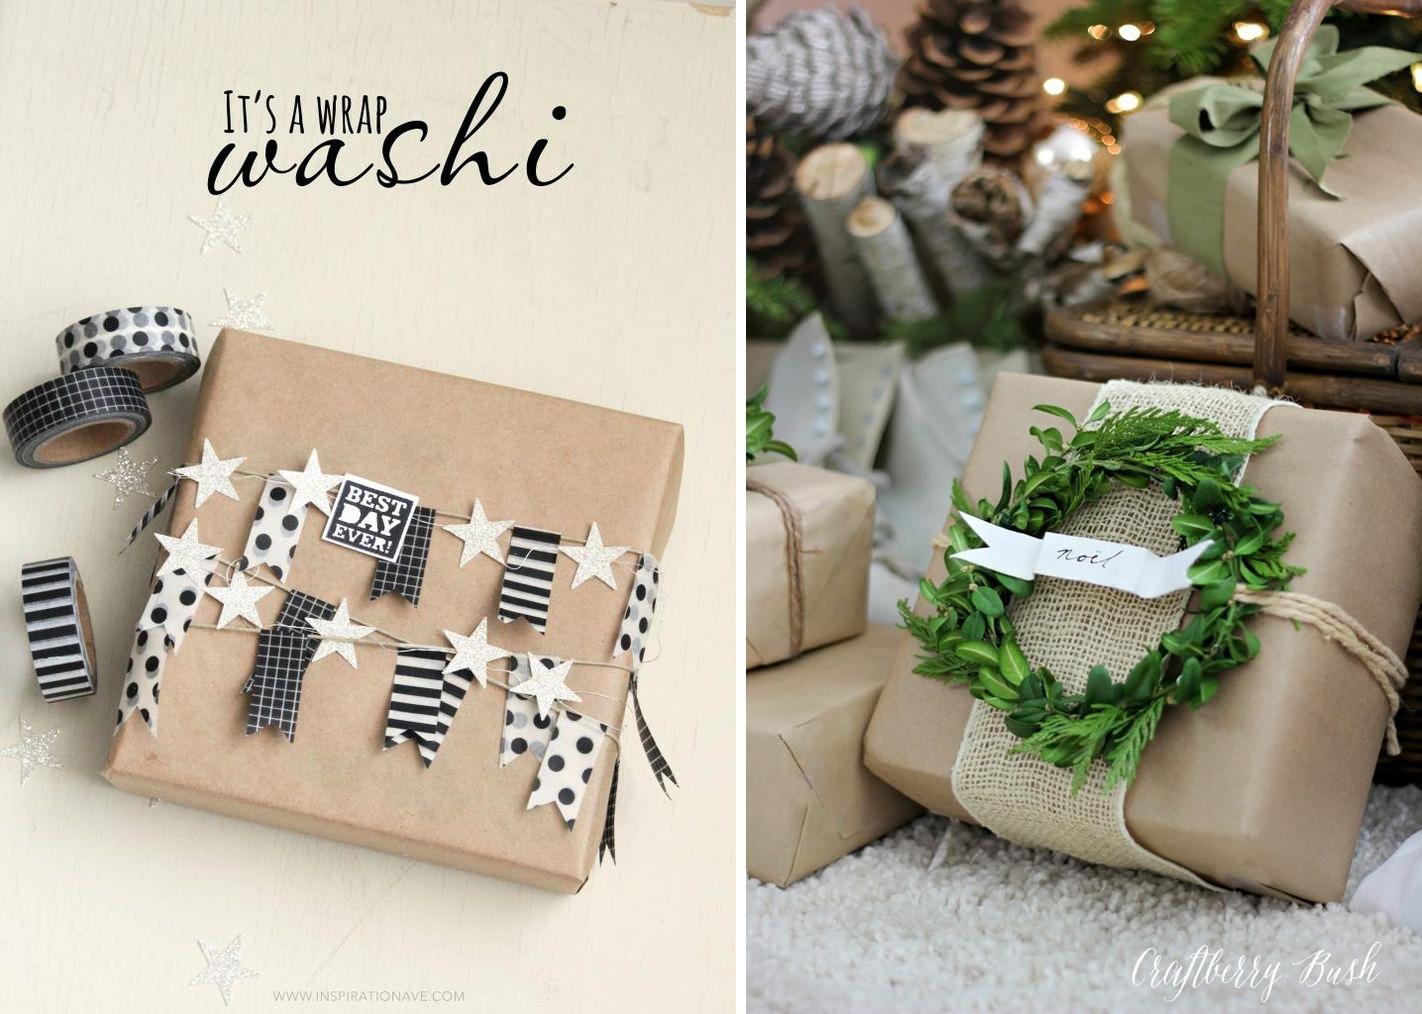 jak pakowac prezenty christmas package papier pakowy pomysly inspiracje